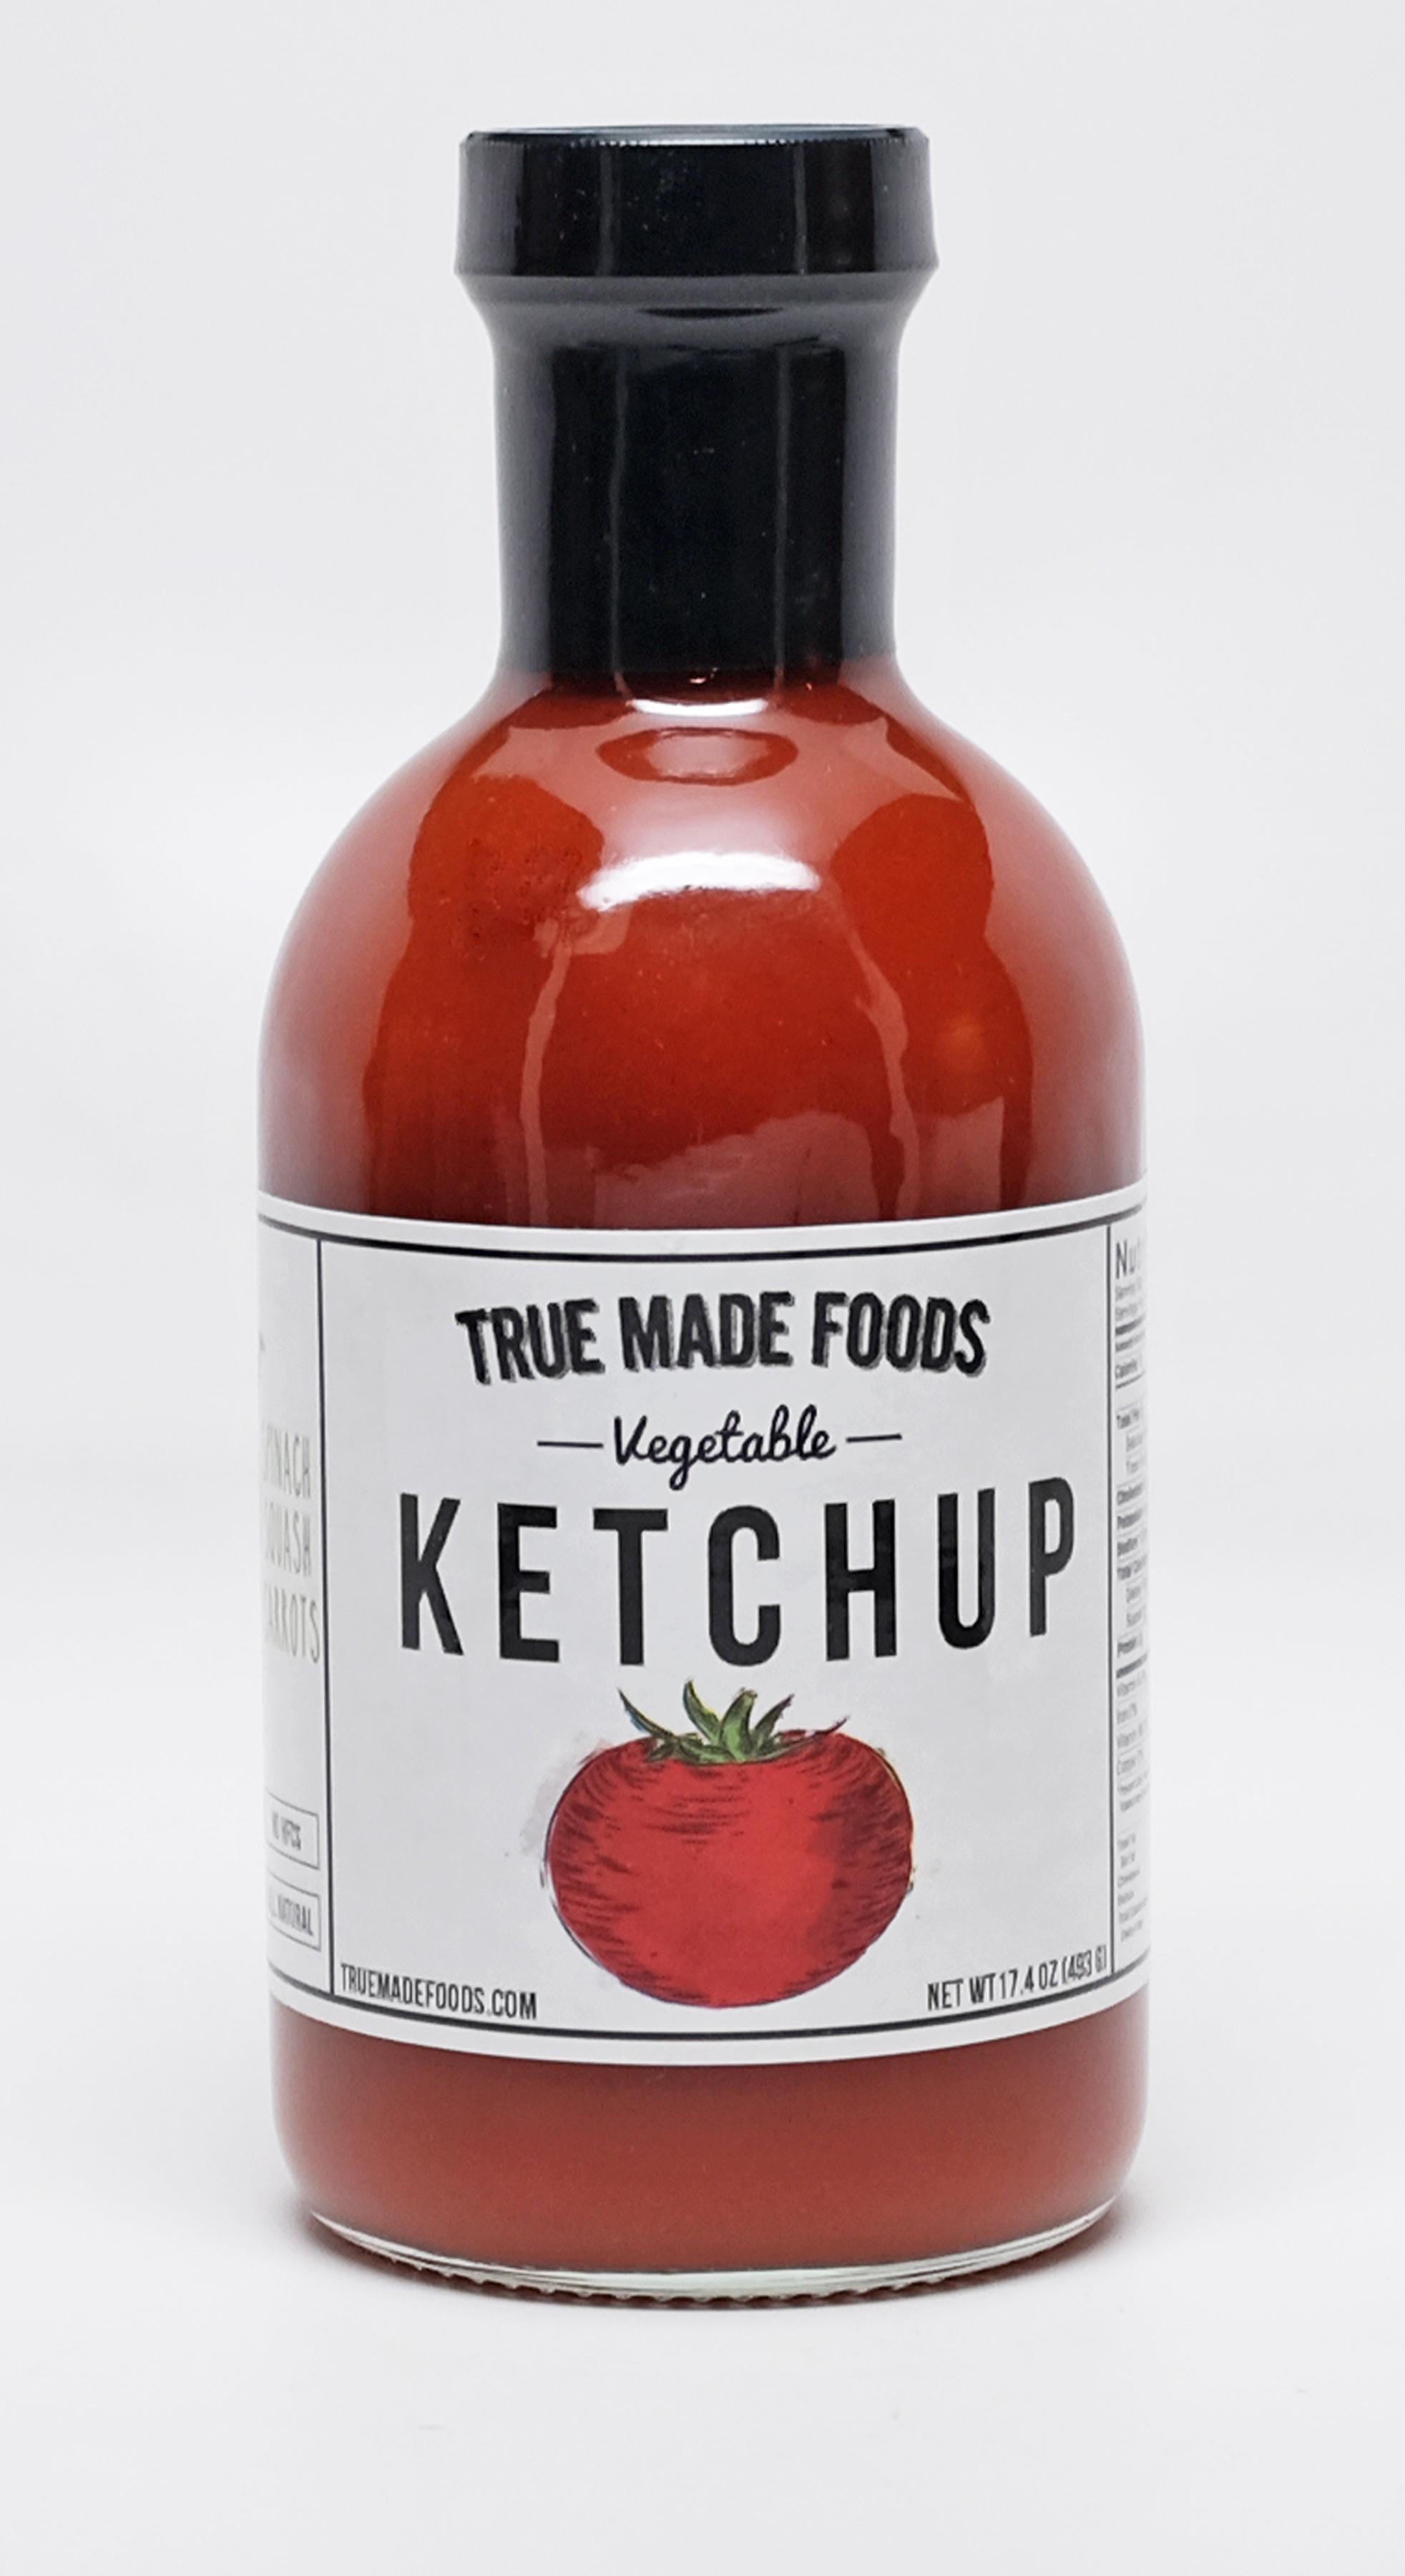 True Made Foods: Vegetable Ketchup